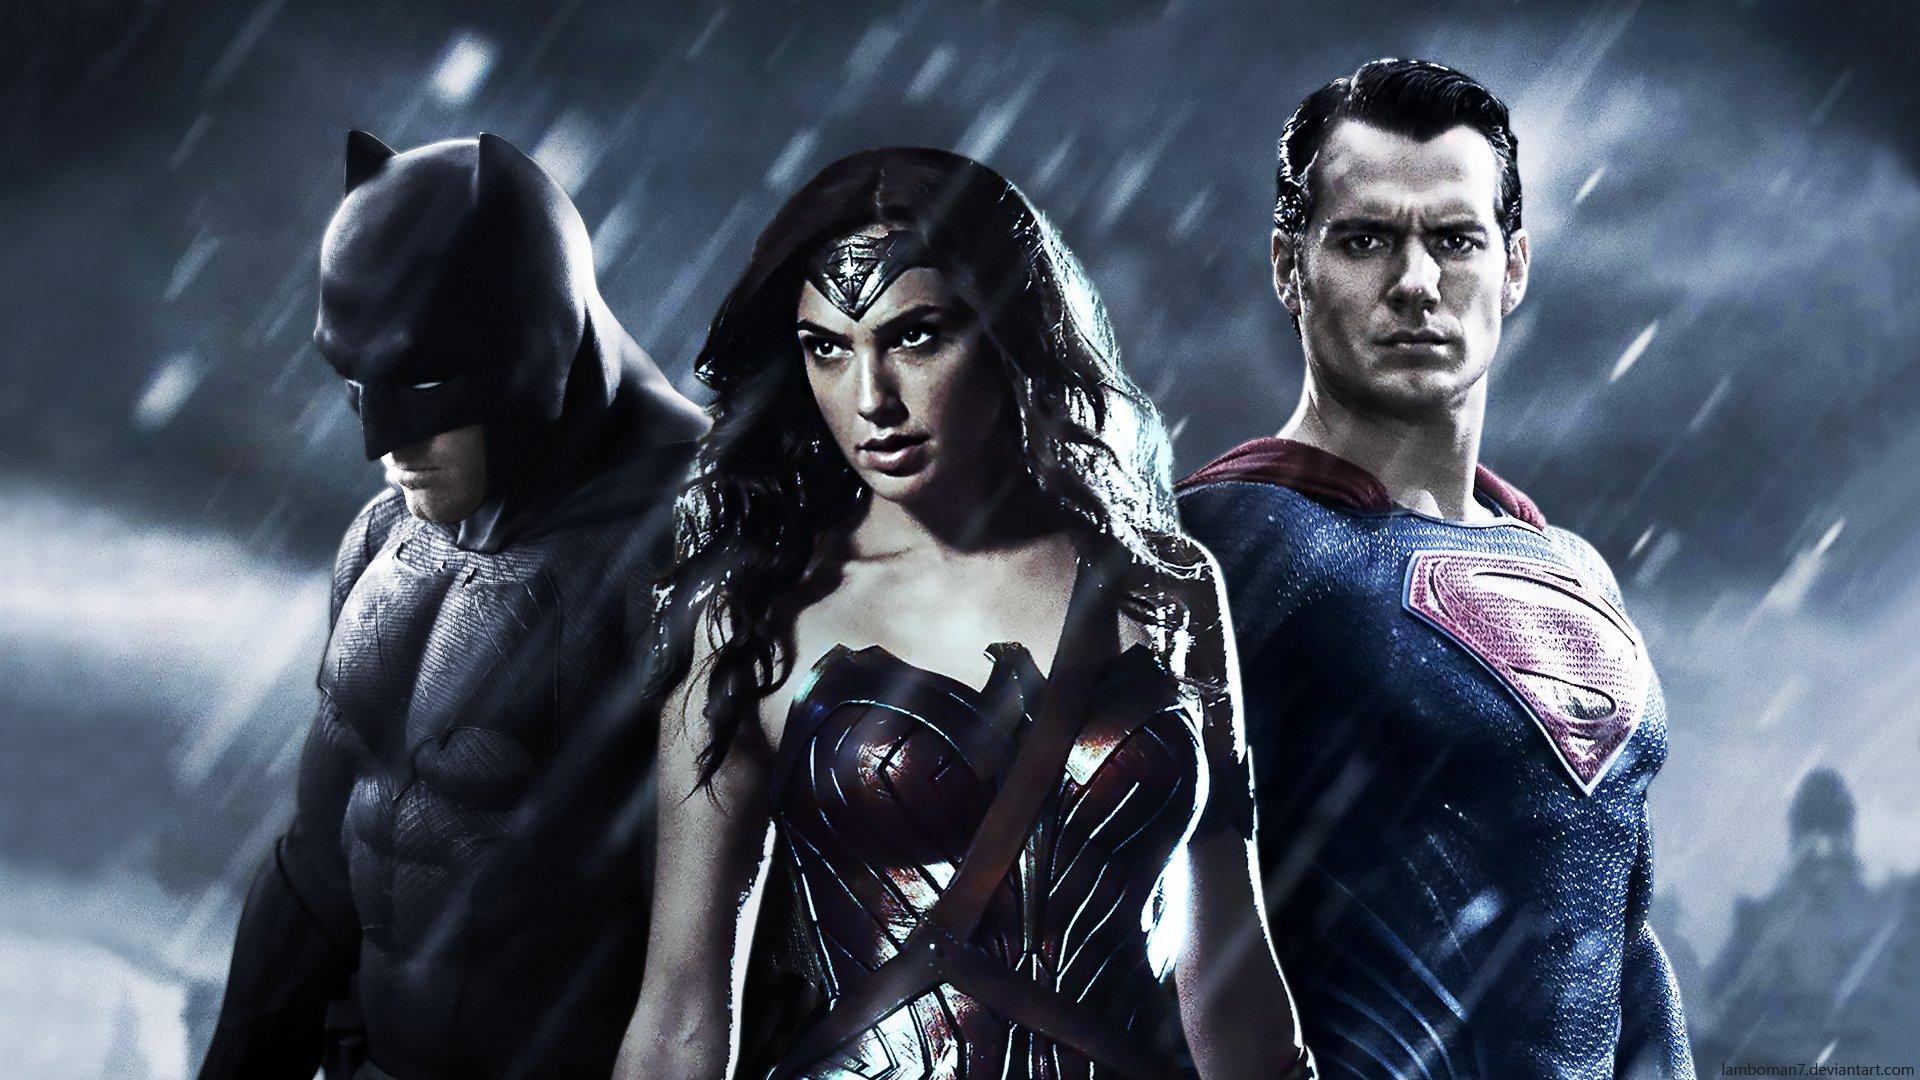 BATMAN v SUPERMAN adventure action batman superman dawn justice wonder 1920x1080